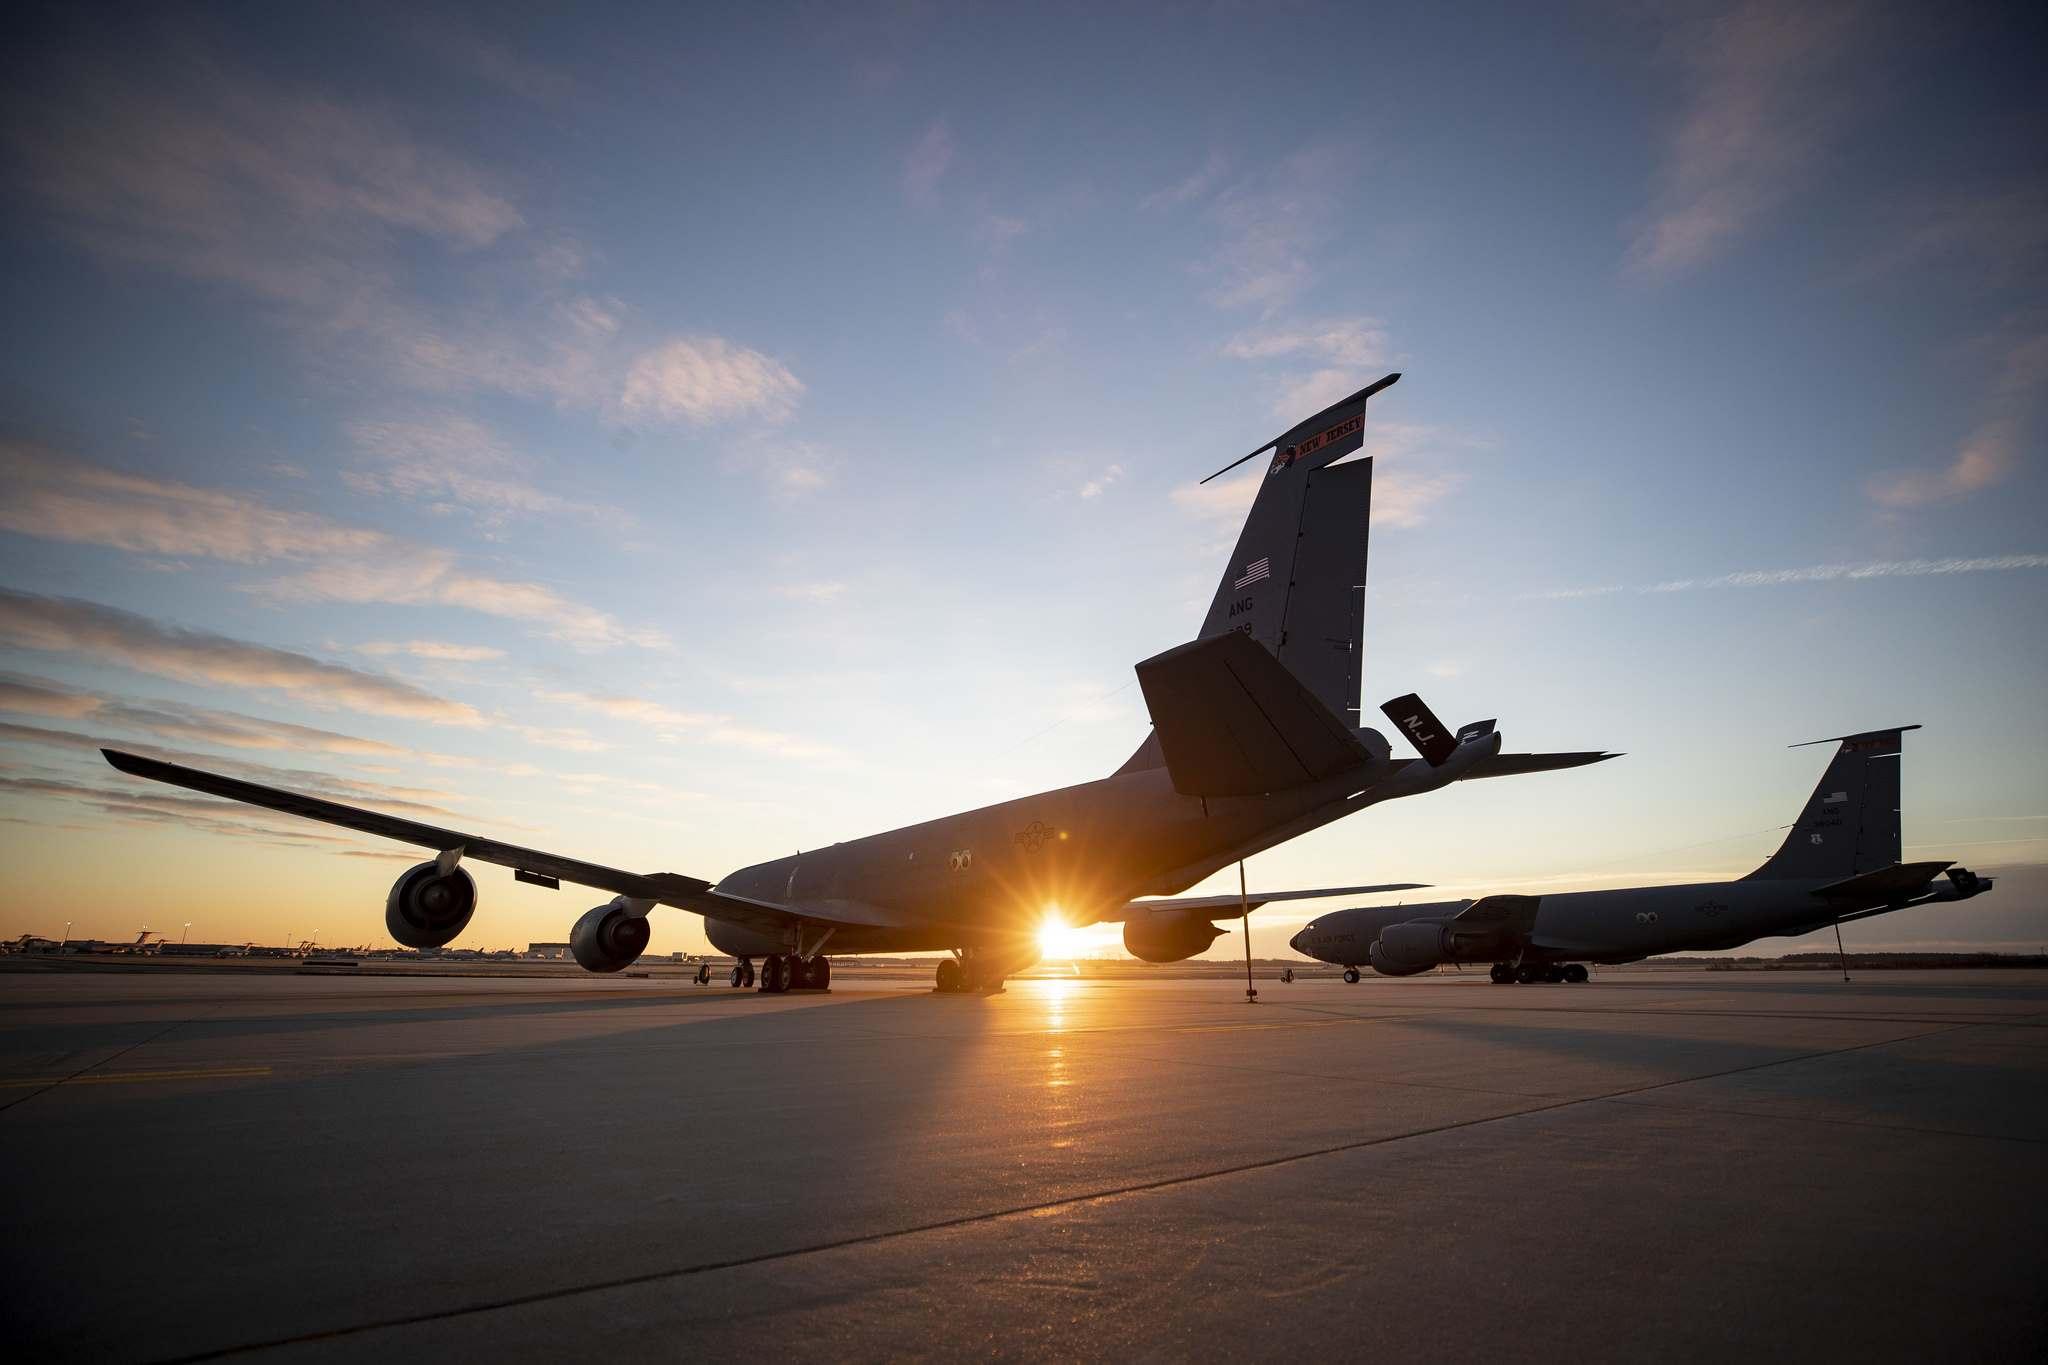 boeing kc 1355 Boeing KC 135R Stratotanker Photos